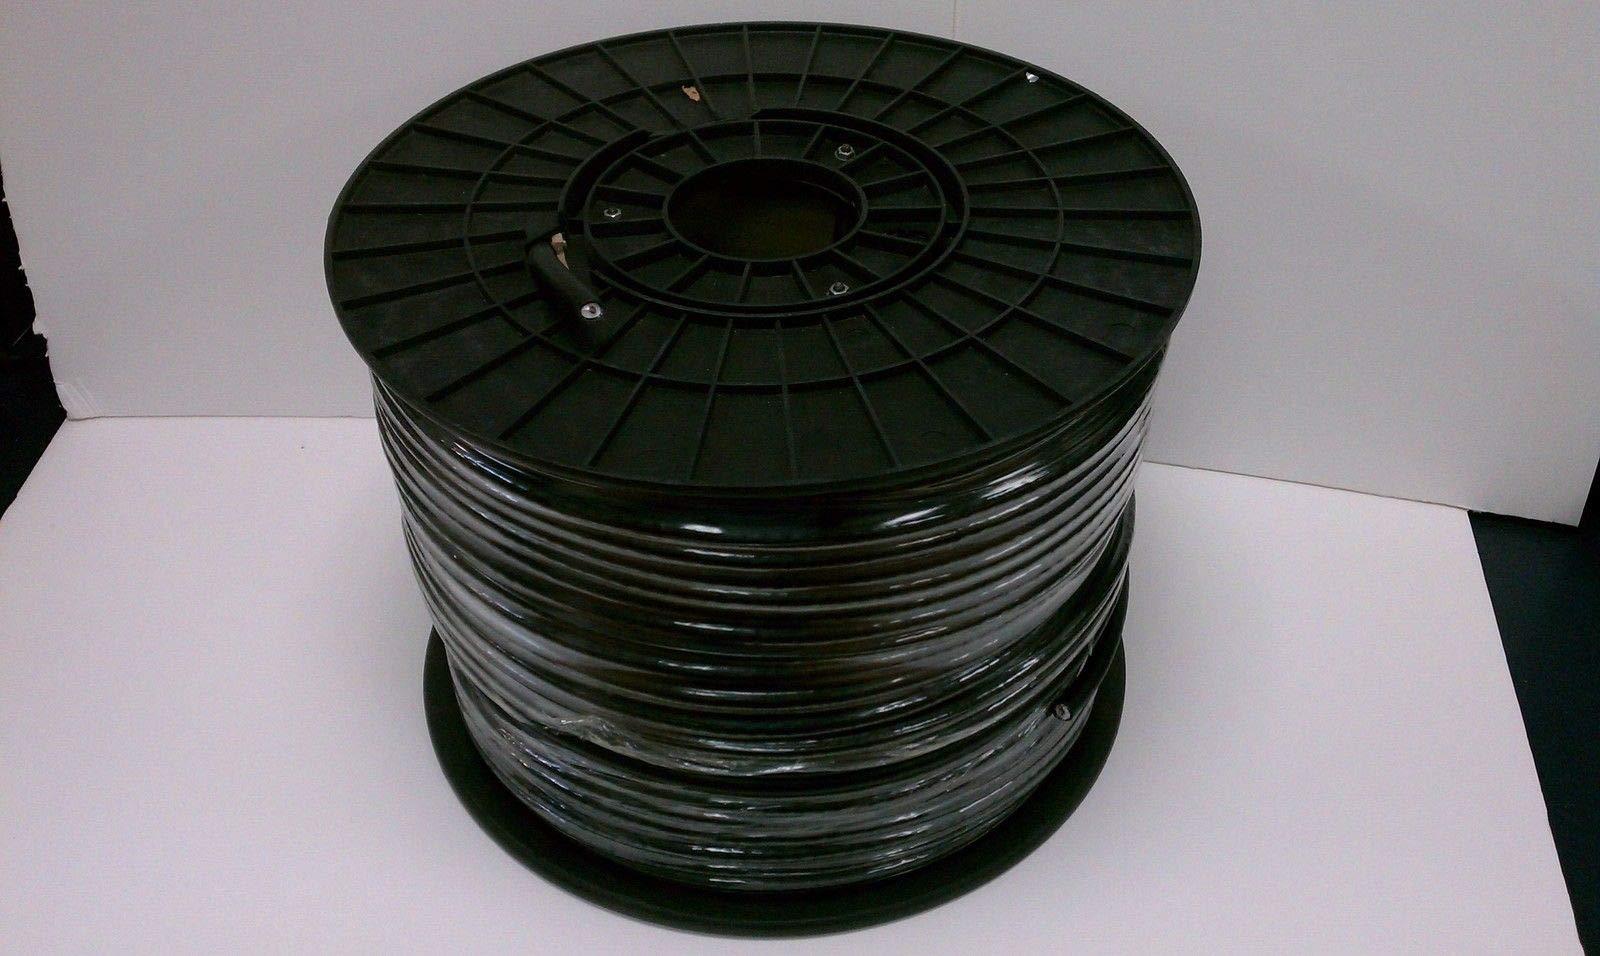 RG8u Spool Reel Coaxial Cable 500F 50 ohm RG8 (RG8/U OR RG8U) 500Ft Spool